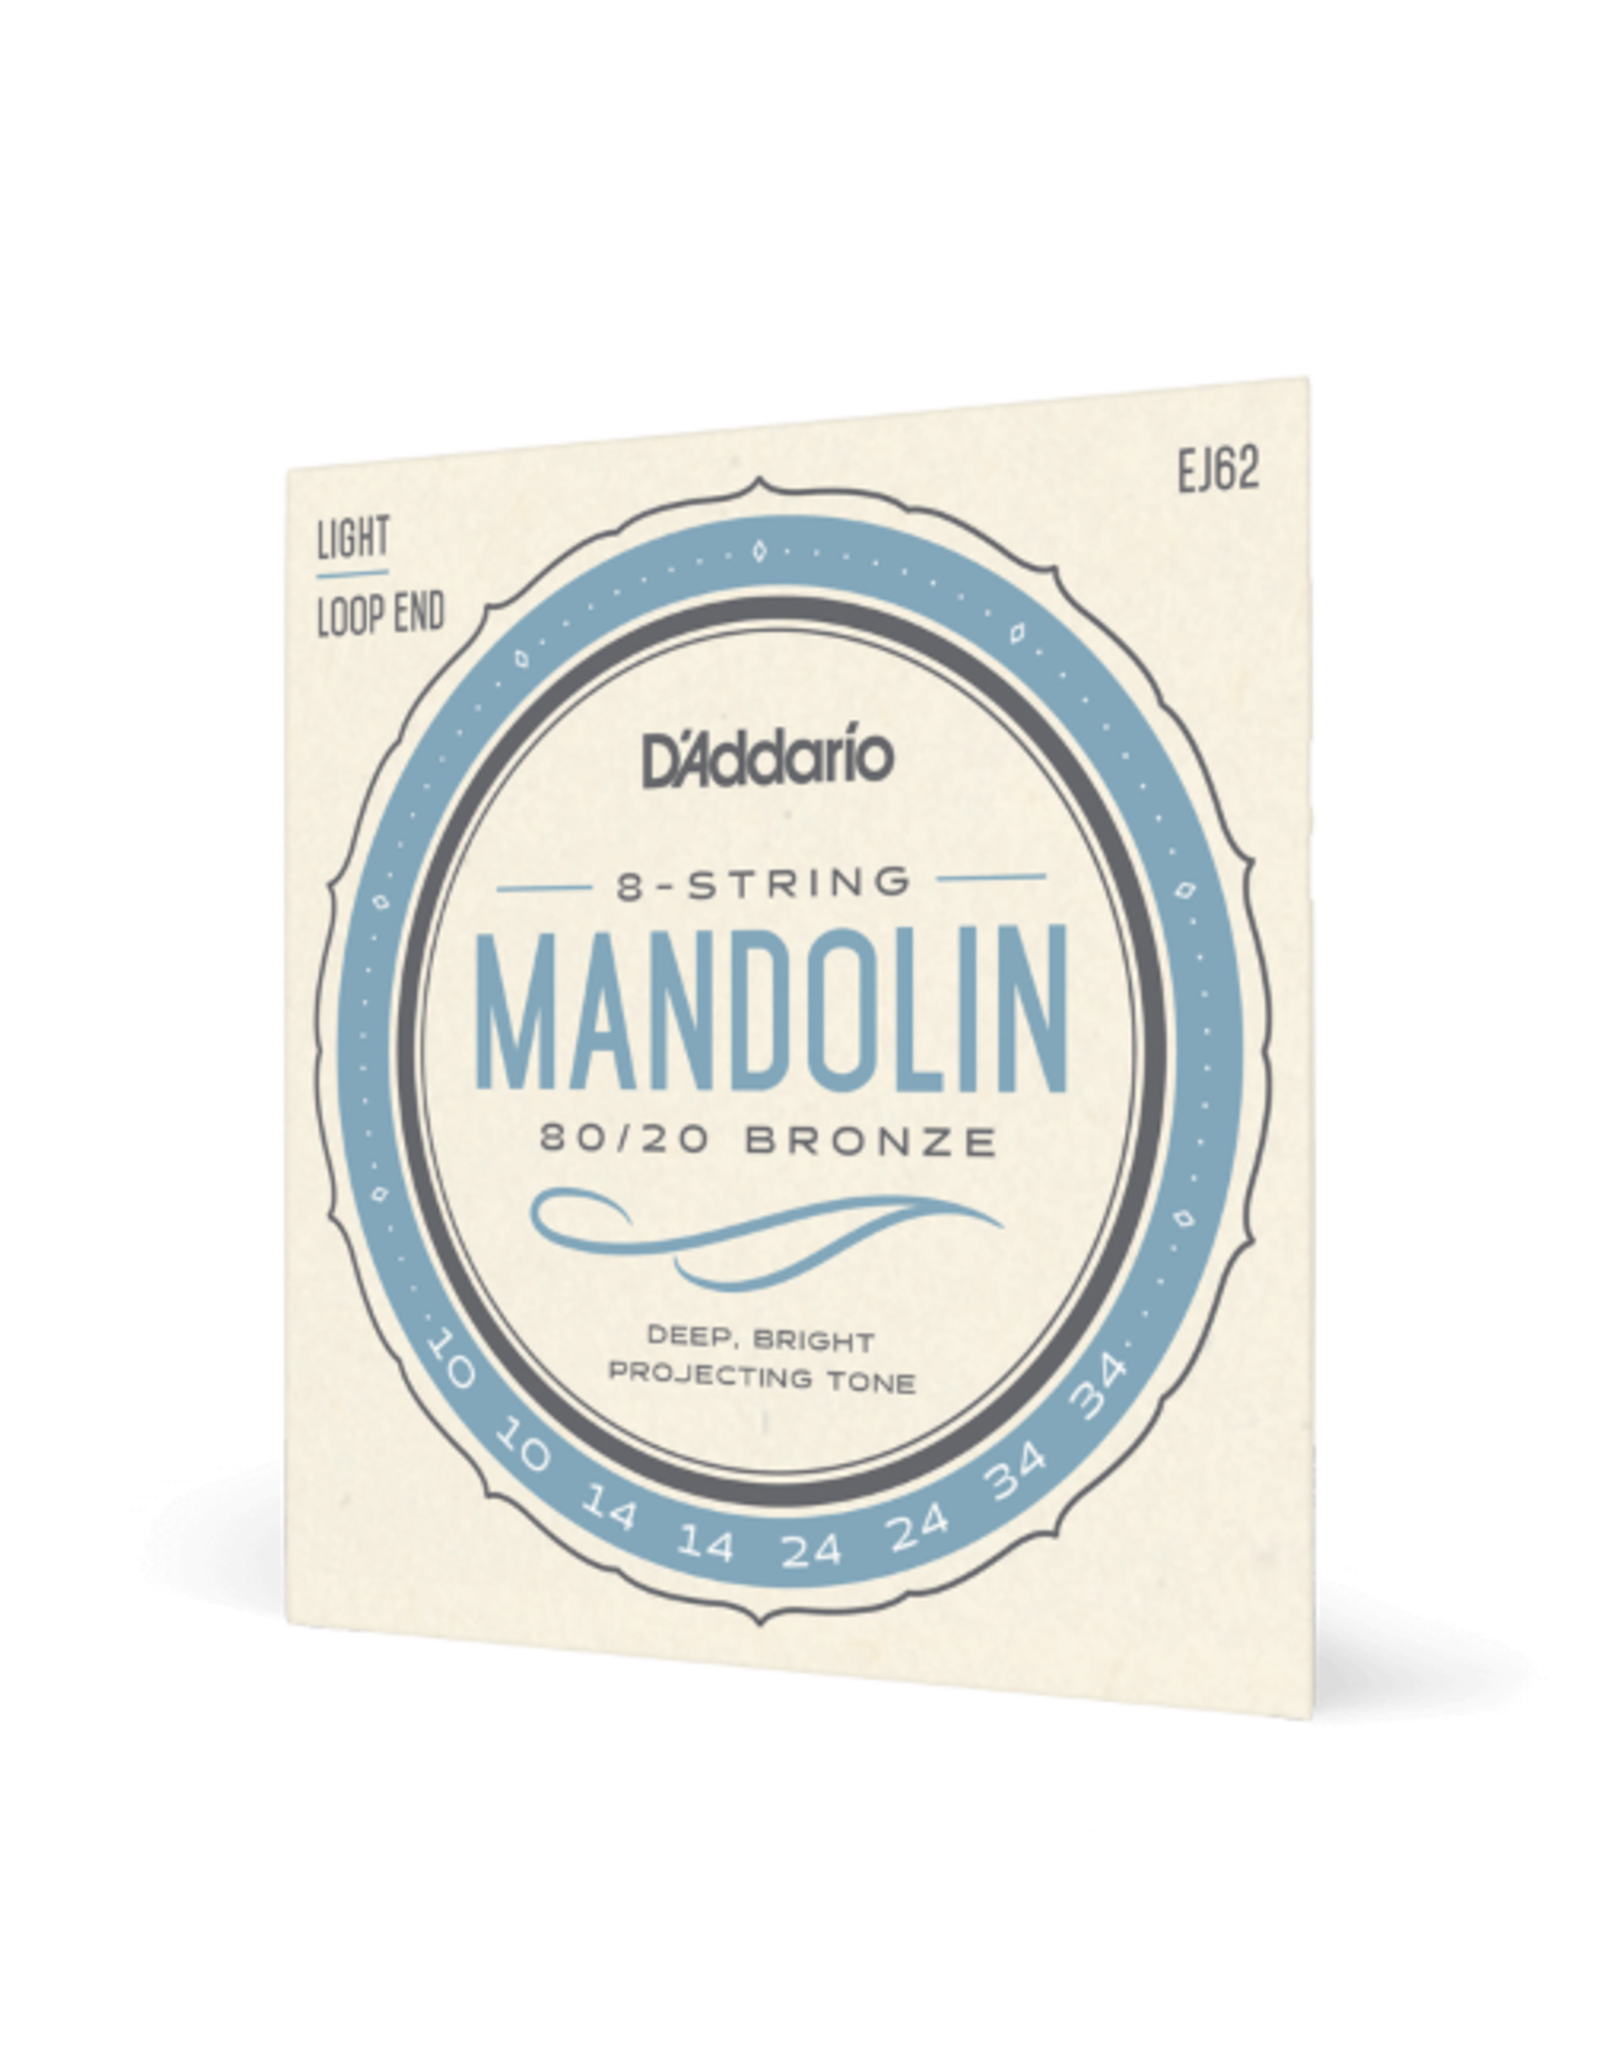 D'Addario D'Addario EJ62 80/20 Bronze Mandolin Strings, Light, 10-34